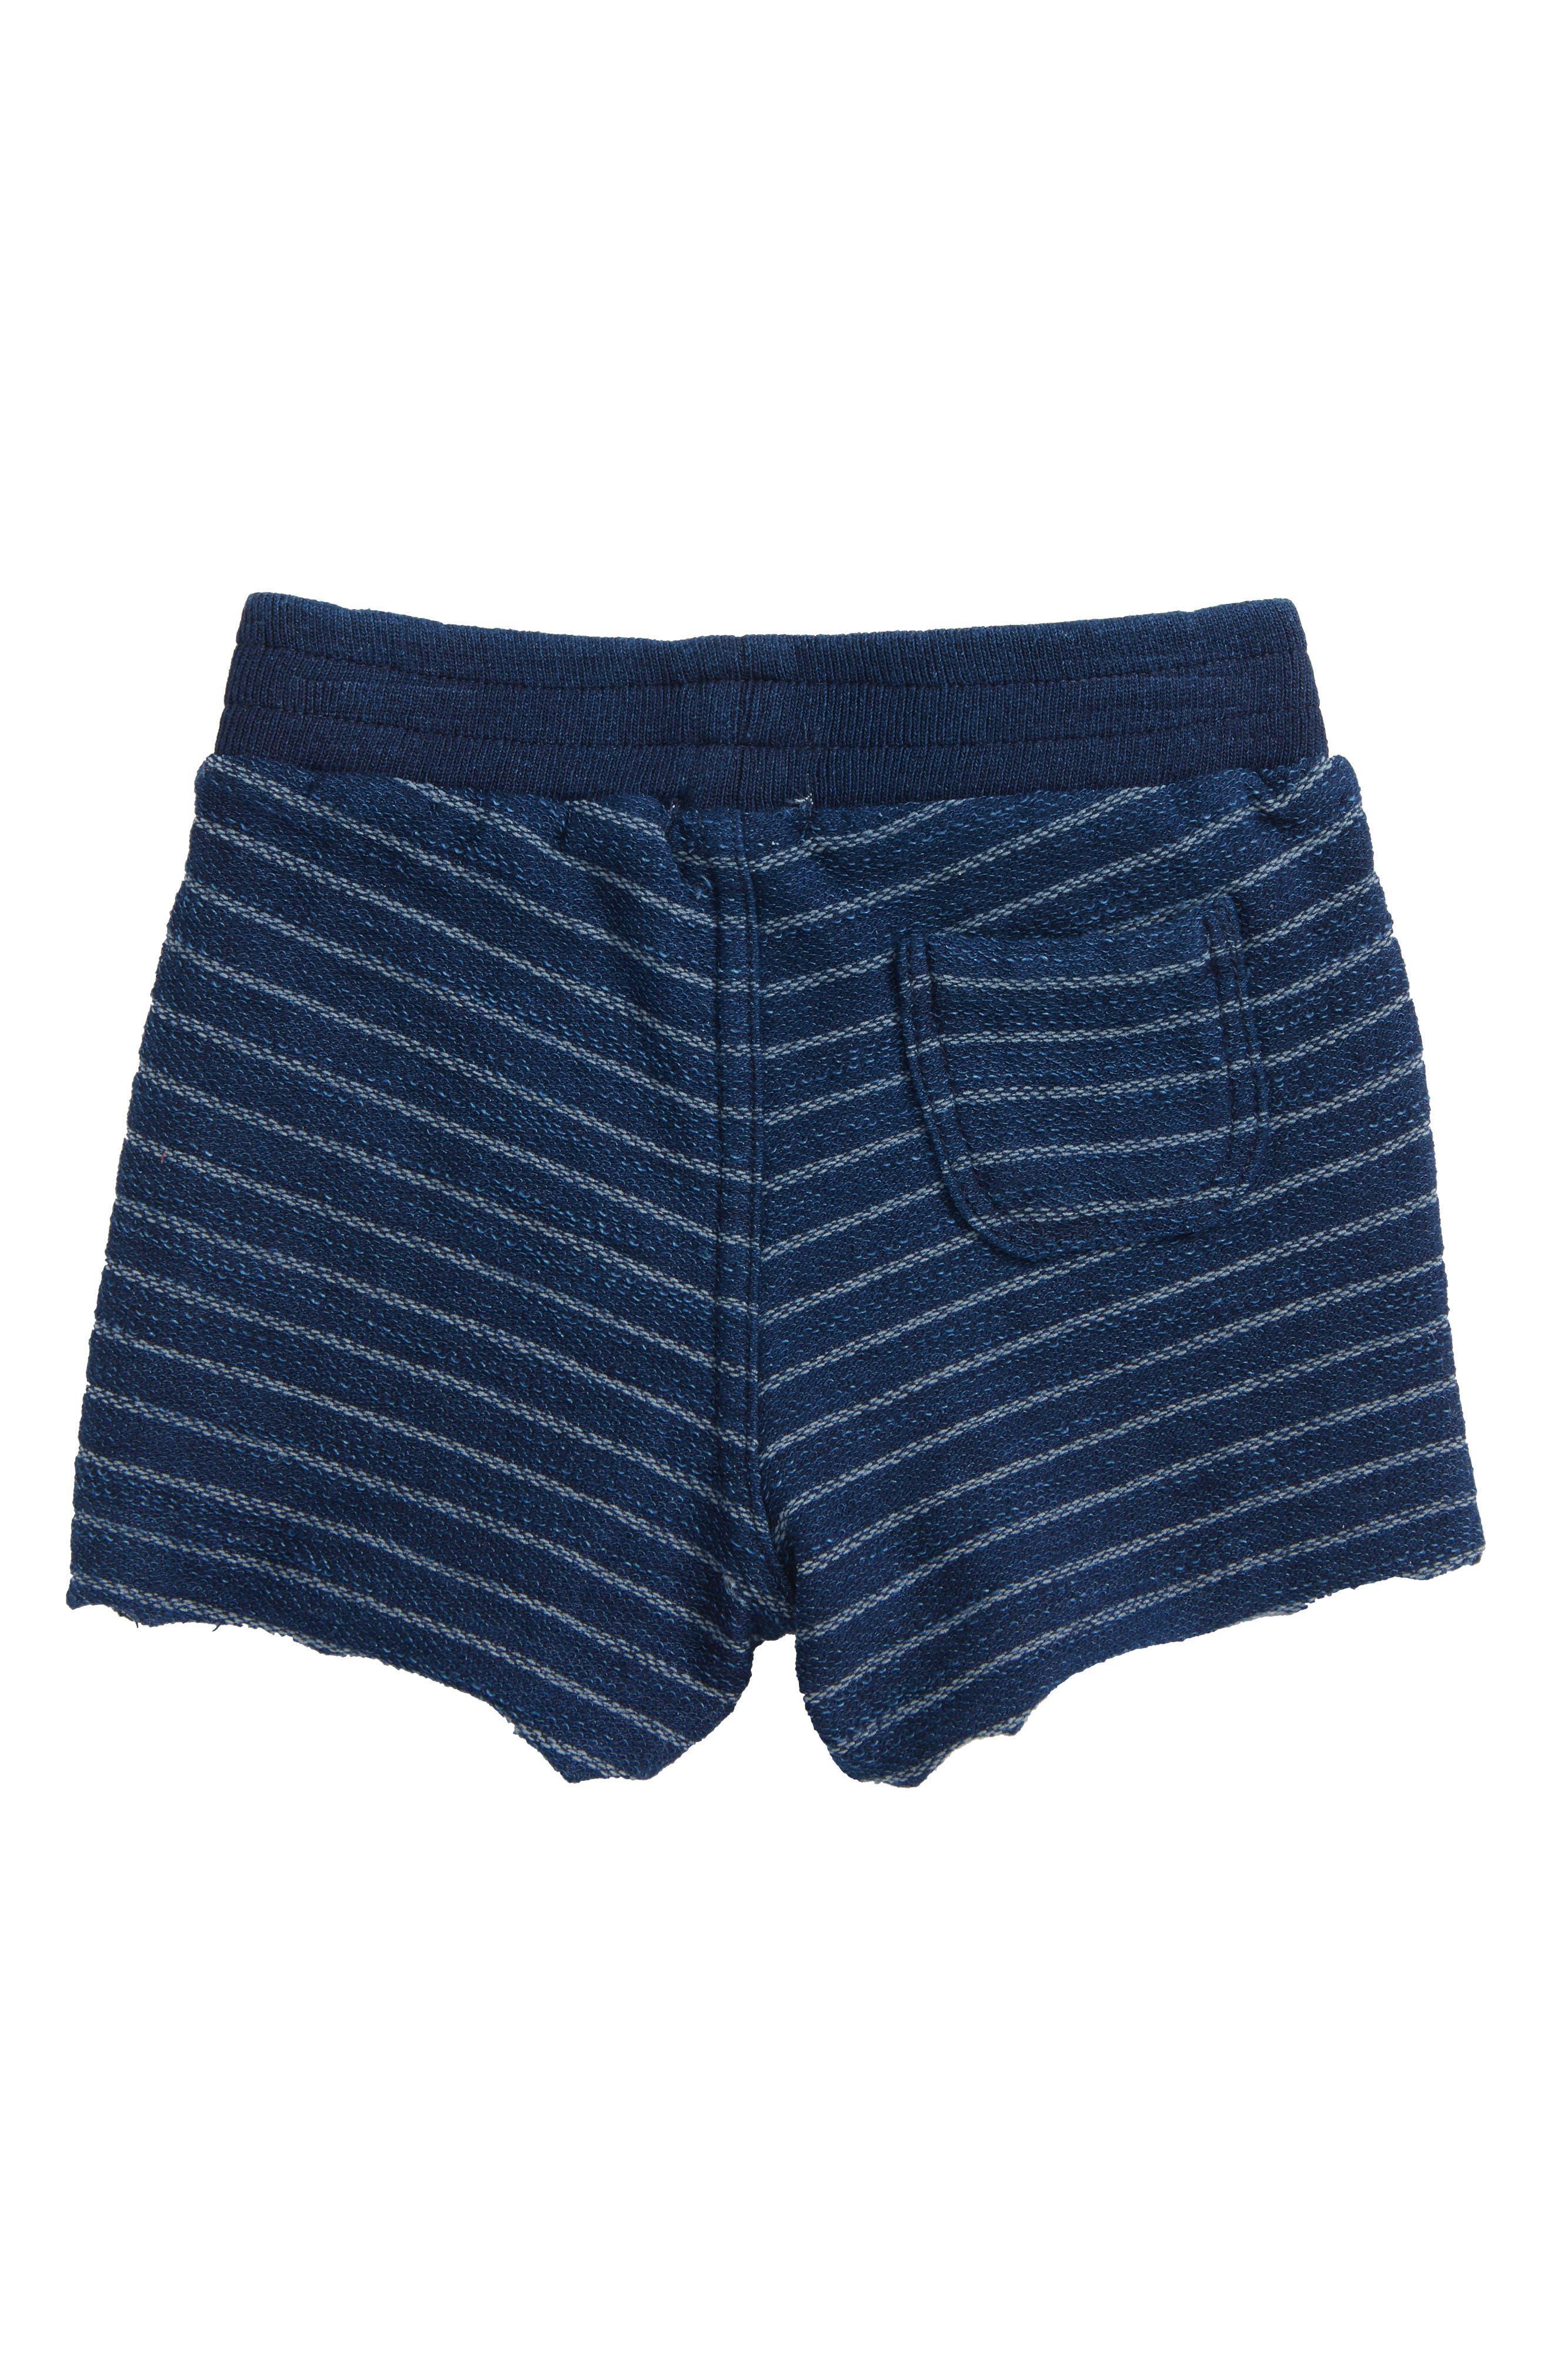 Indigo Stripe French Terry Shorts,                             Alternate thumbnail 2, color,                             Dark Stone/ Indigo